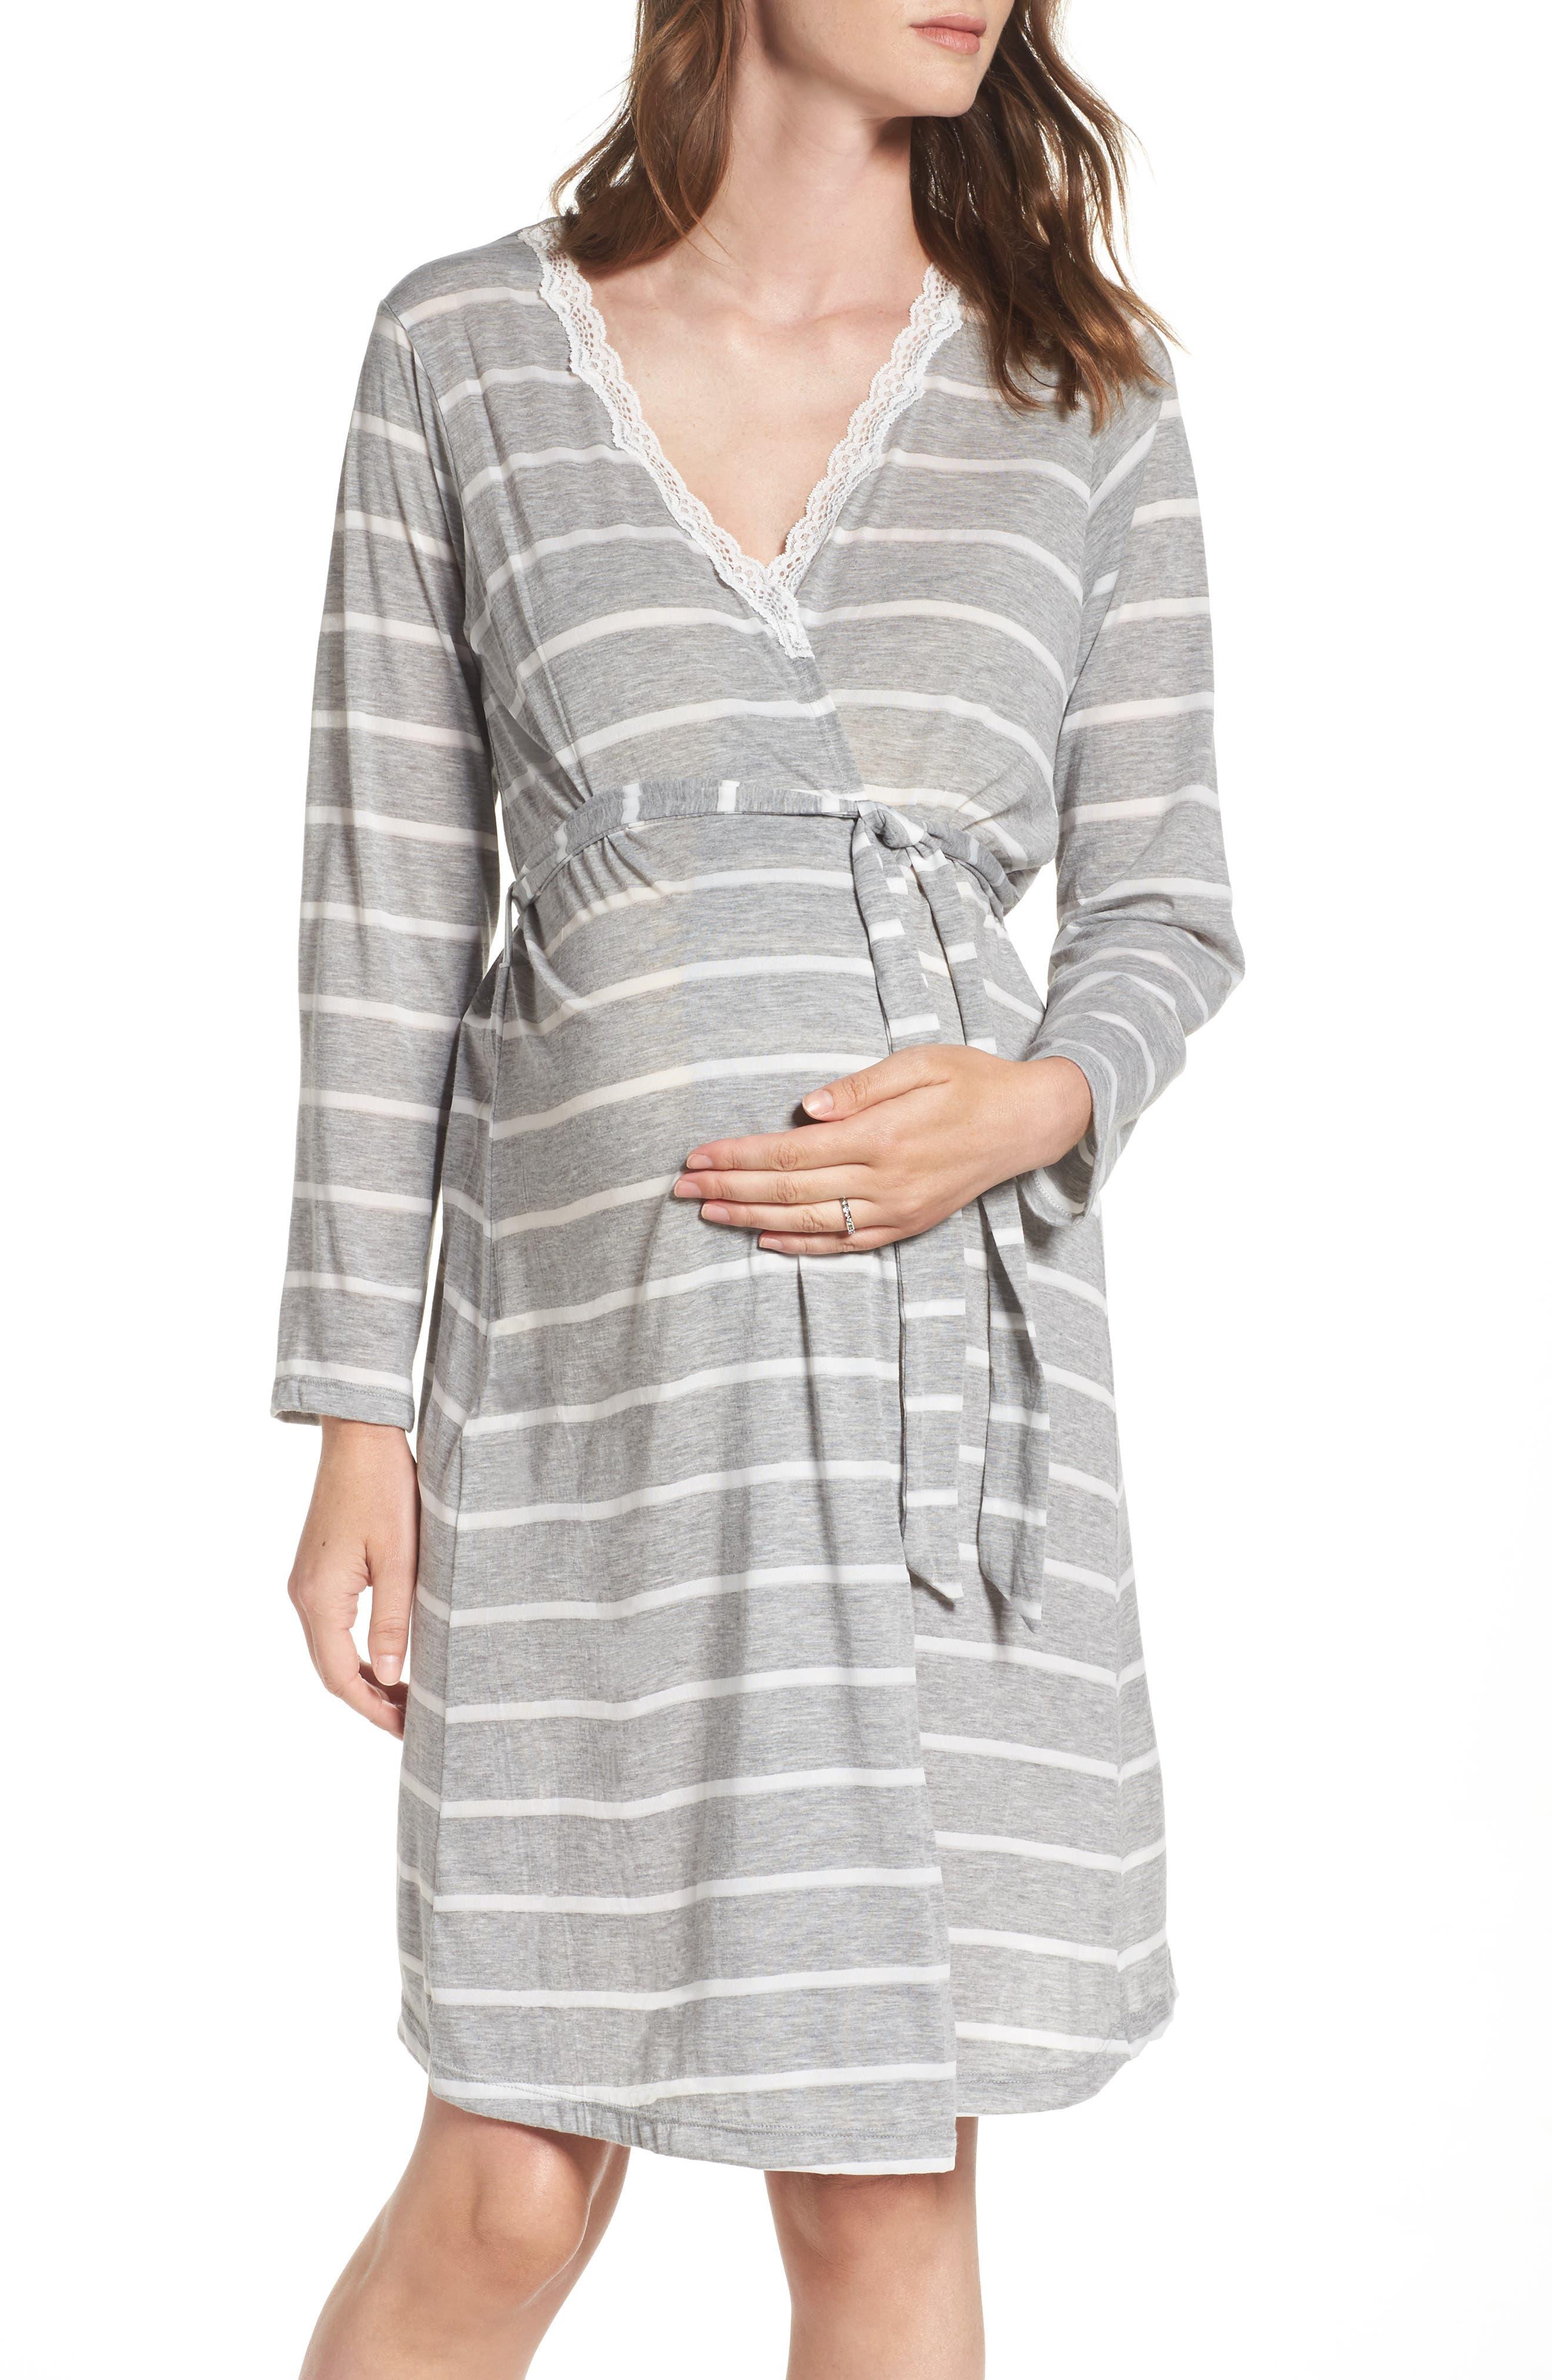 Belabumbum Heather Maternity Robe